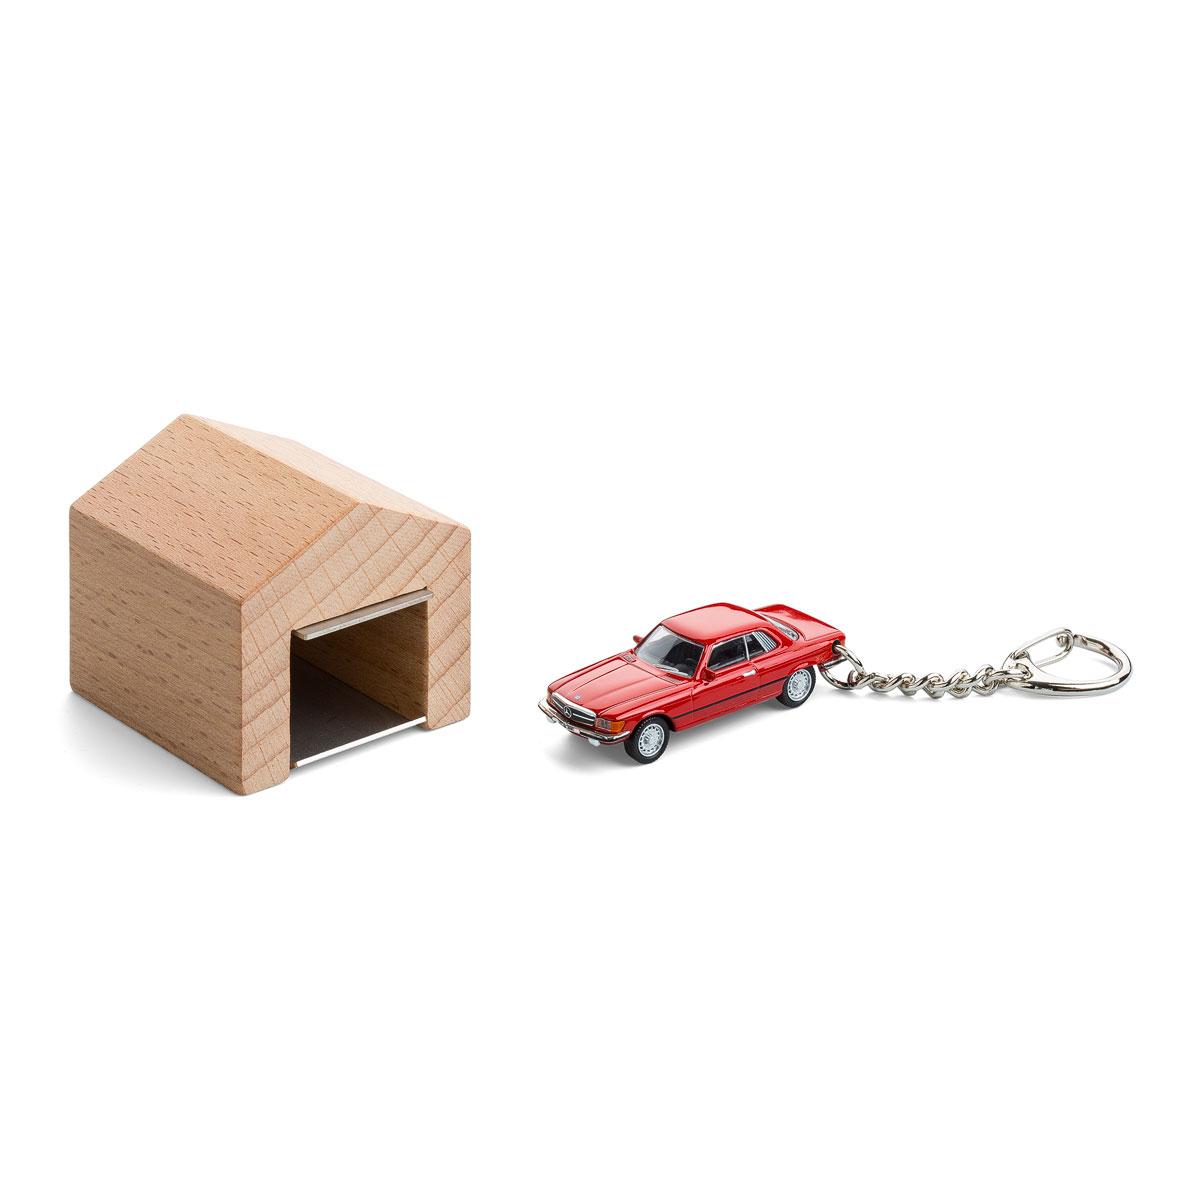 garage mit schl sselanh nger mercedes benz 450 slc kaufen corpus delicti design hamburg. Black Bedroom Furniture Sets. Home Design Ideas